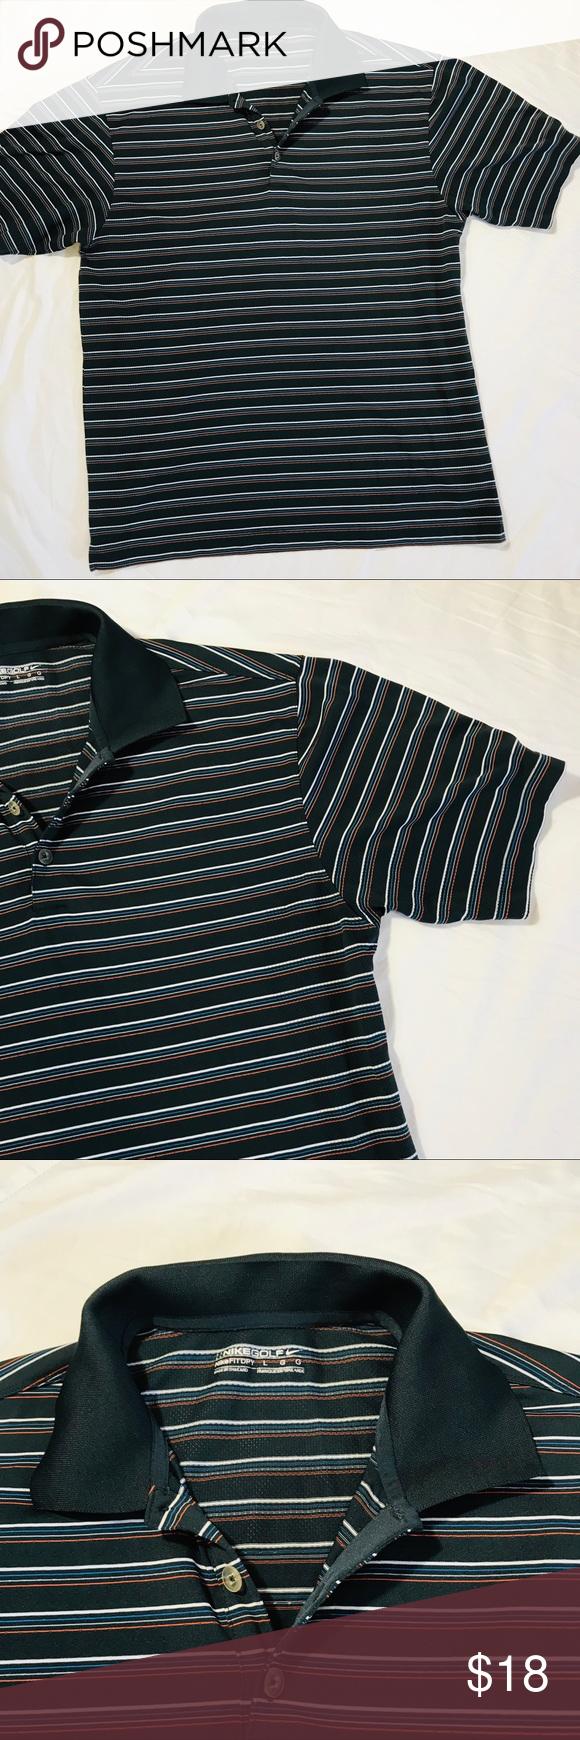 a4a3ceff Men's Nike Golf Polo Striped golf polo. Performance material. No ...